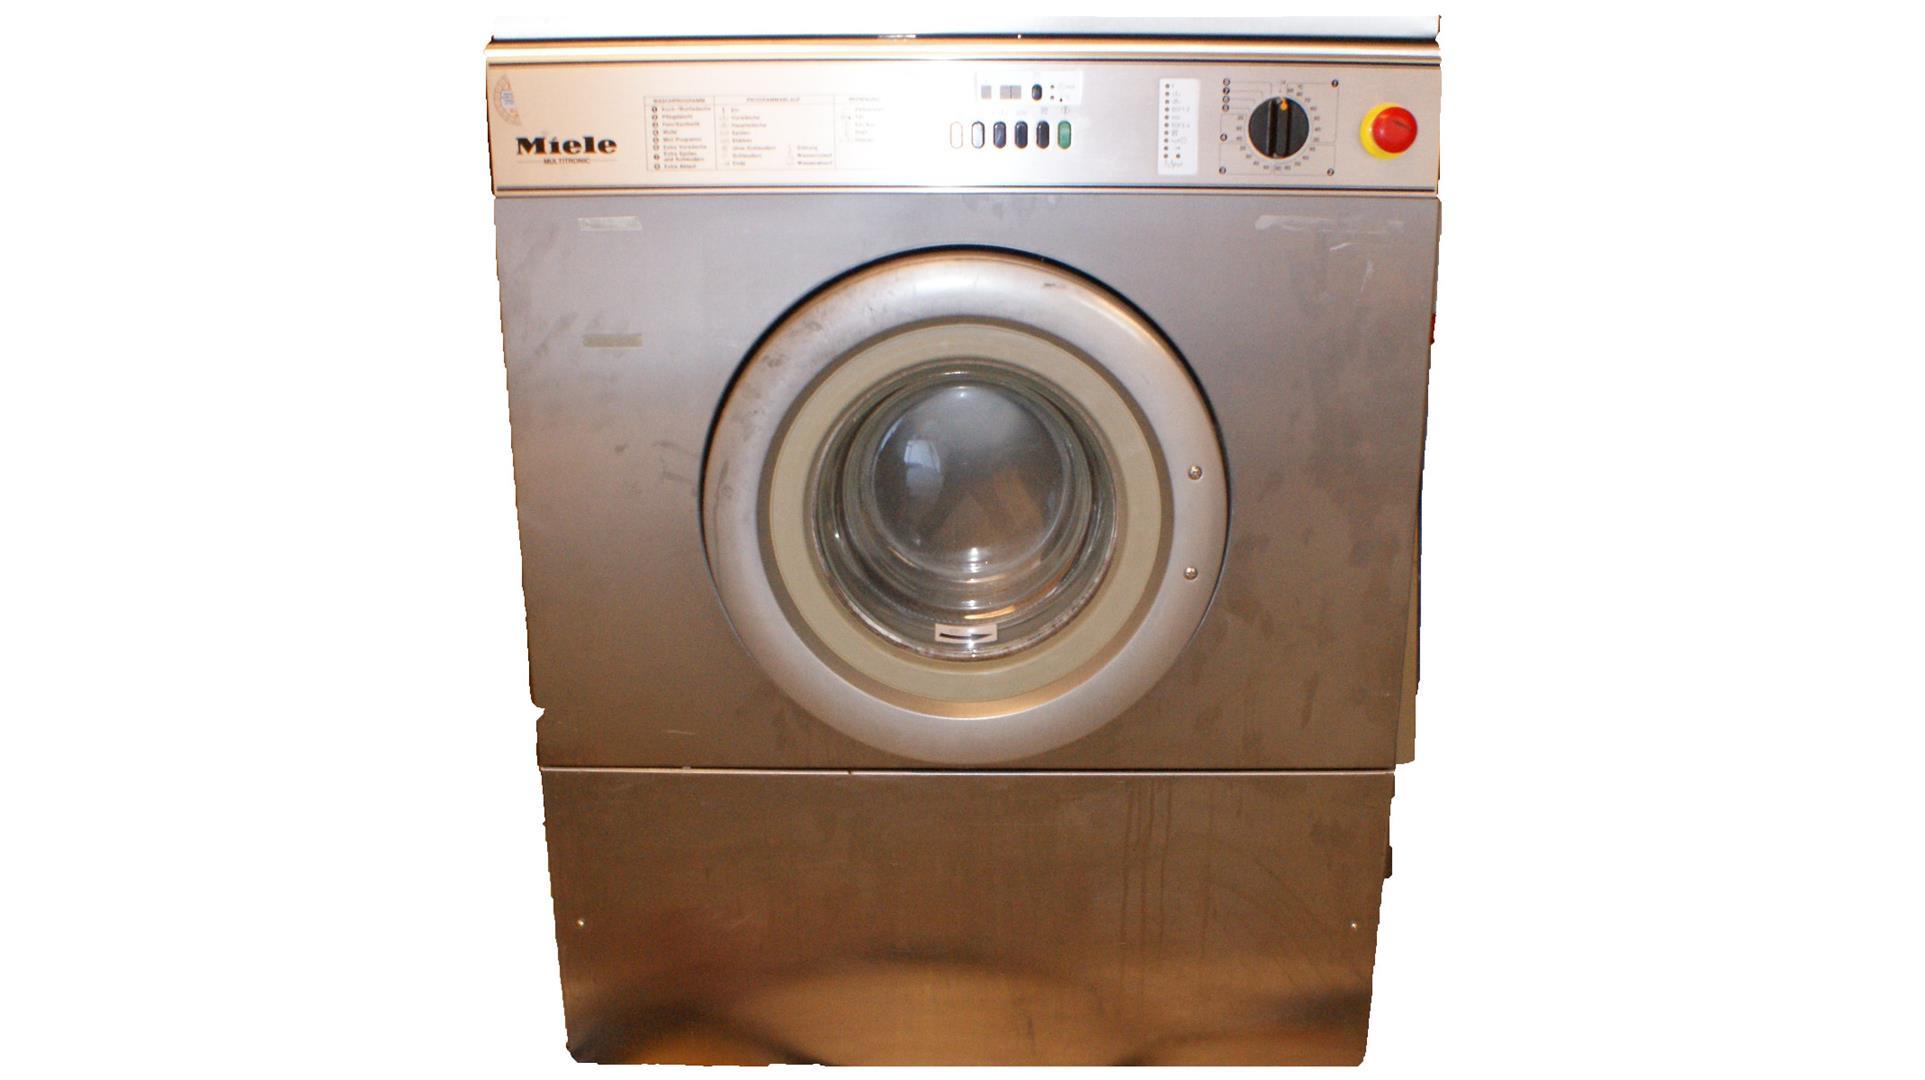 miele professional industriewaschmaschine ws5510mc bj 1991 waschmaschinen waschmaschinen. Black Bedroom Furniture Sets. Home Design Ideas